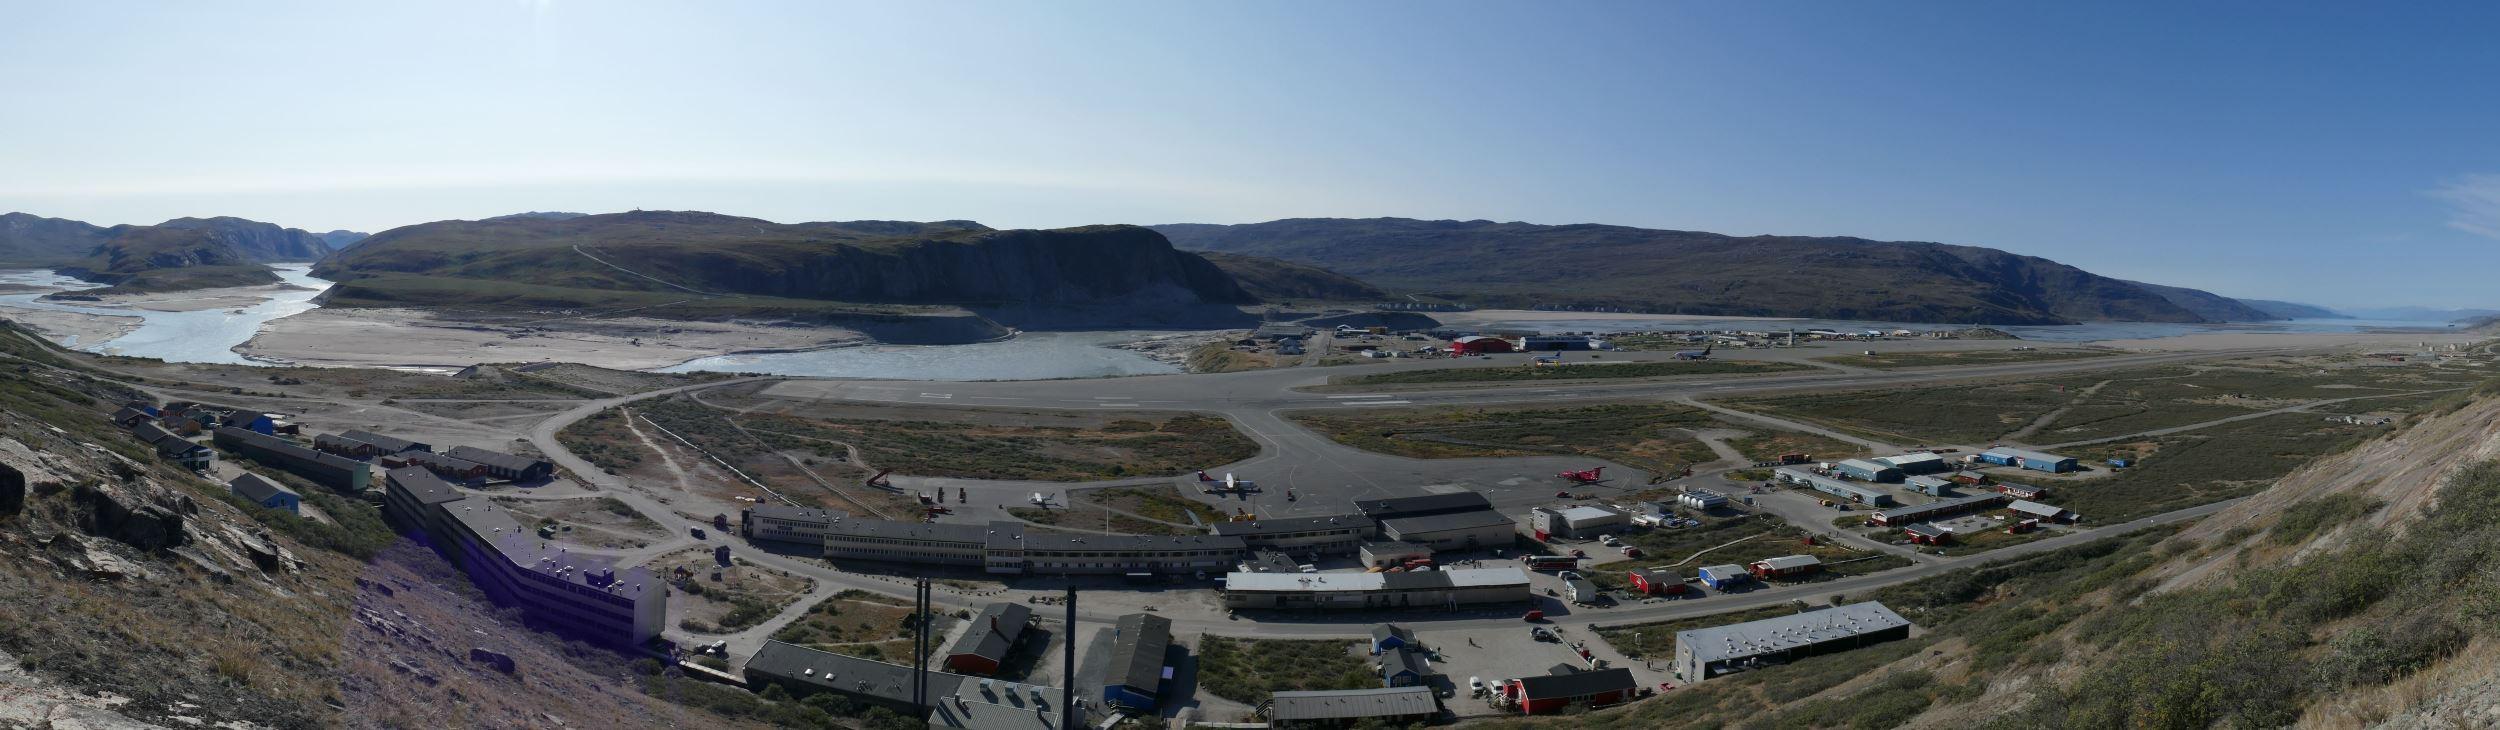 Grönland-Kangerlussuaq-Panorama